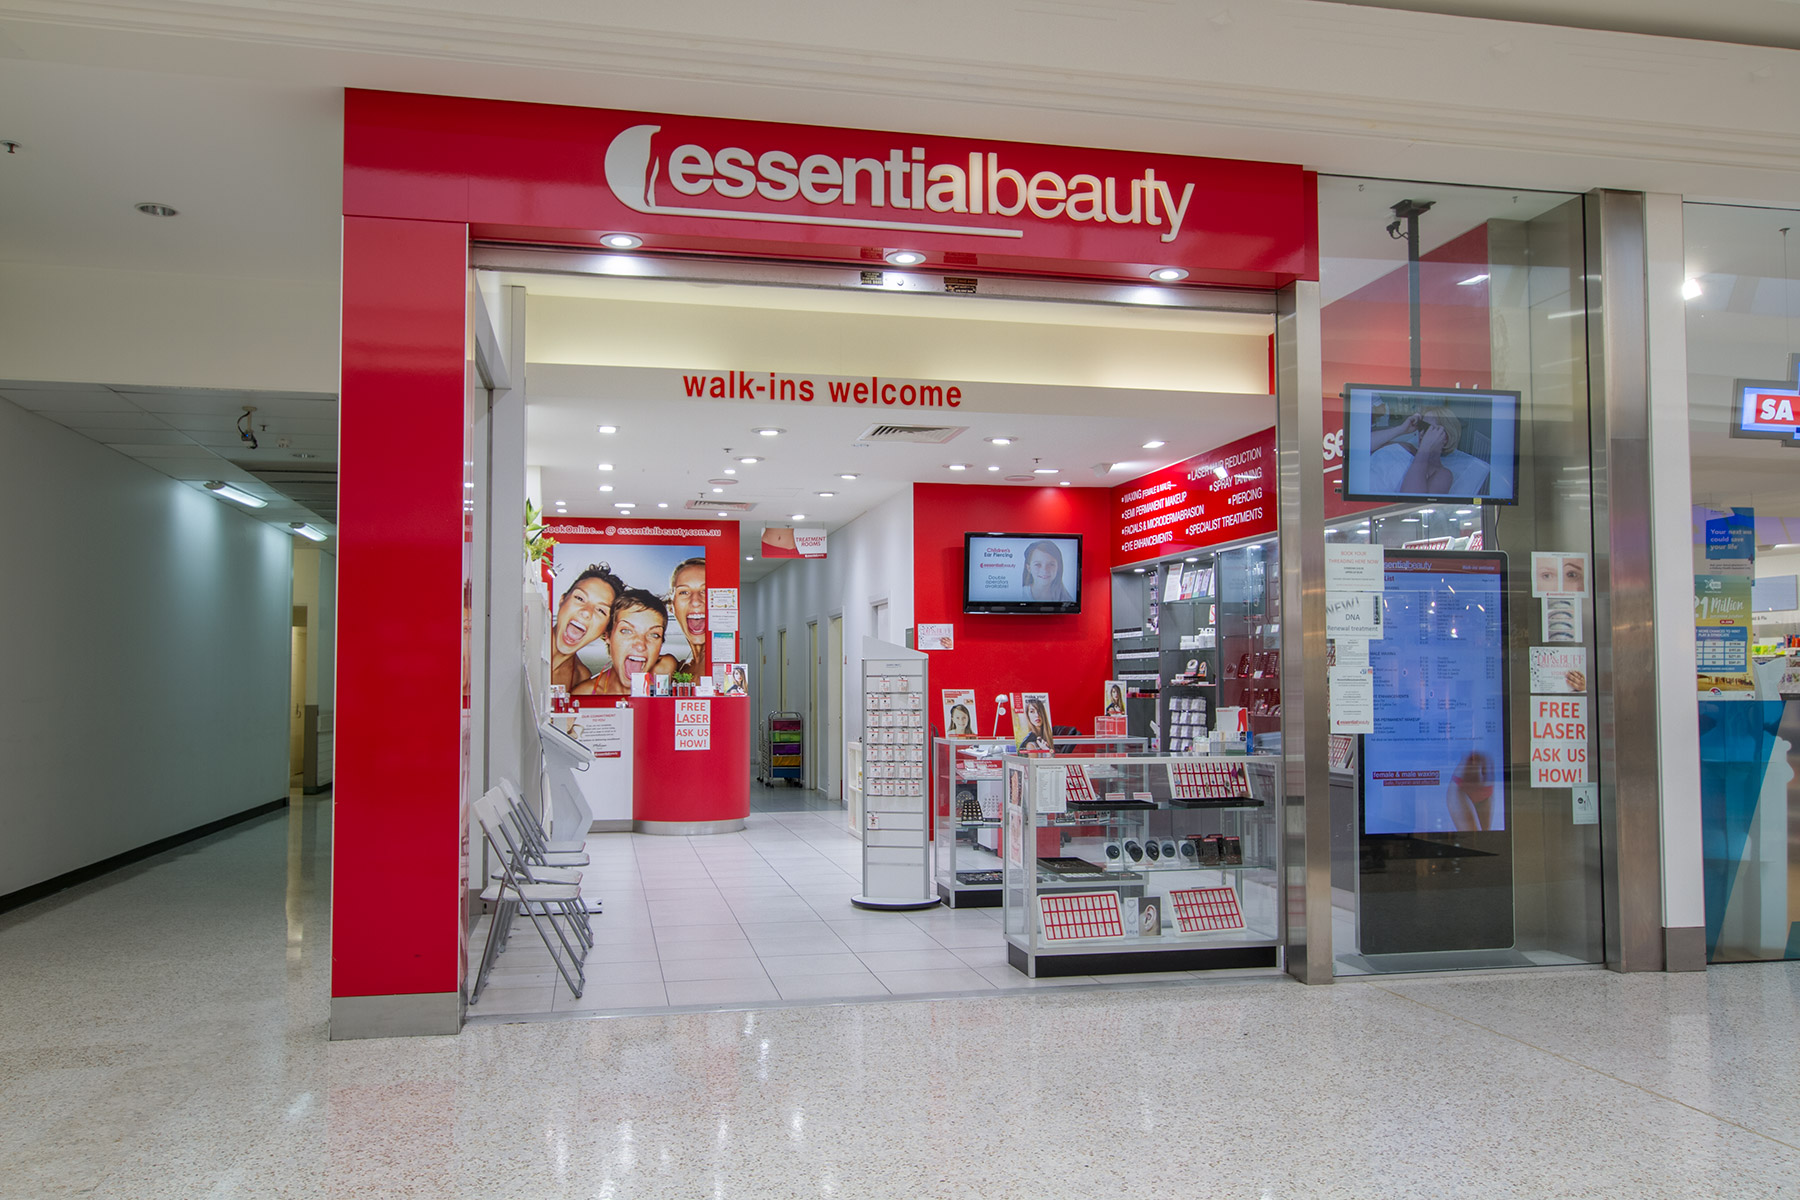 australia-fair-shopping-centre-essential-beauty-franchise-opportunity-2